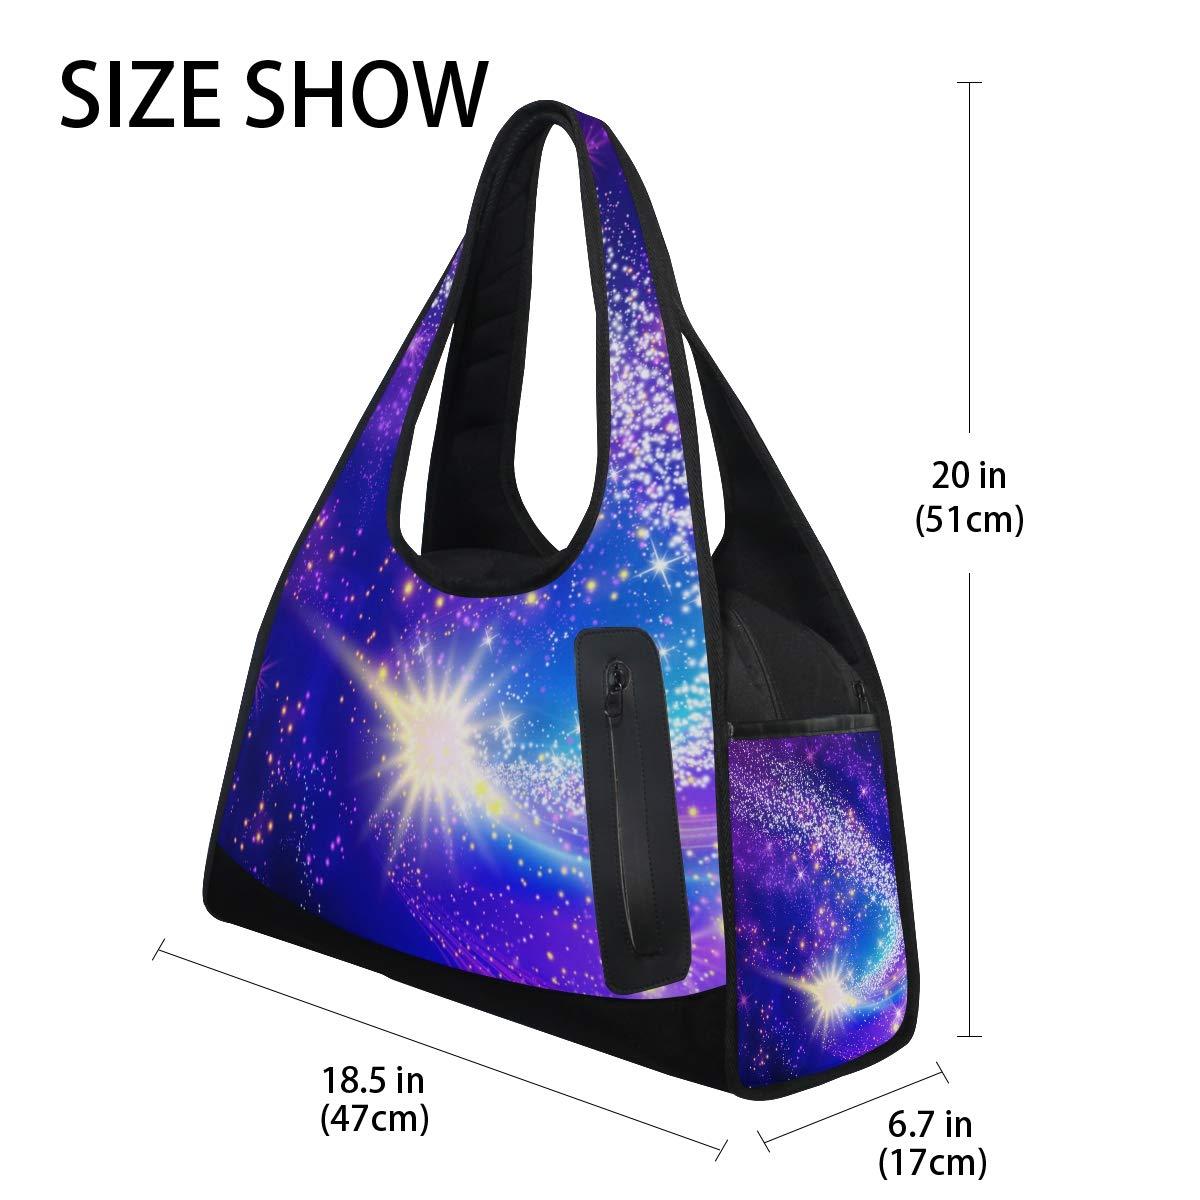 Unisex Travel Duffels Gym Bag Nebula Galaxy Glowing Stars Canvas Weekender Bag Shoulder Bag Totes bags